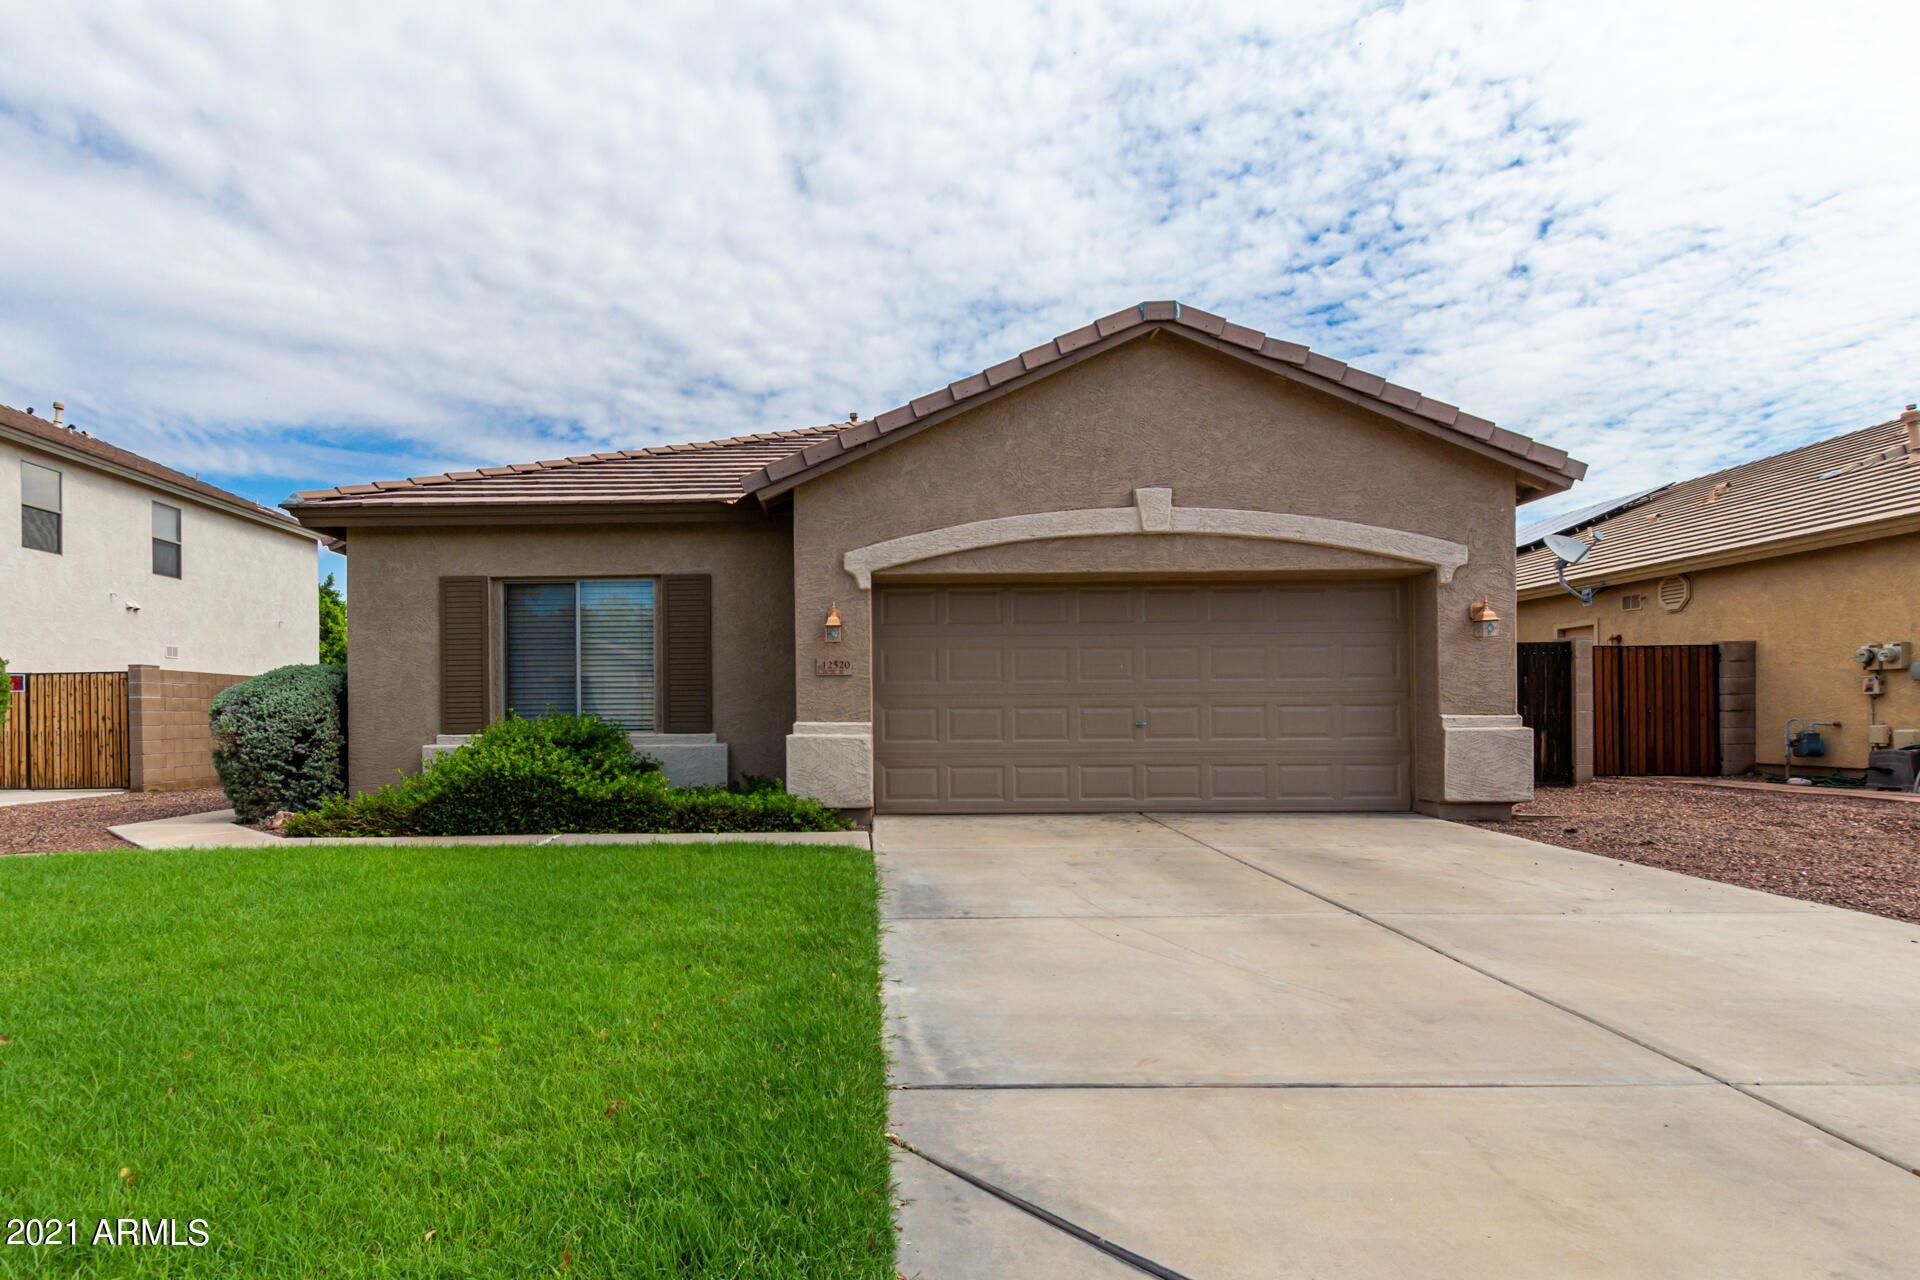 12520 W MODESTO Drive, Litchfield Park, AZ 85340 - MLS#: 6270746